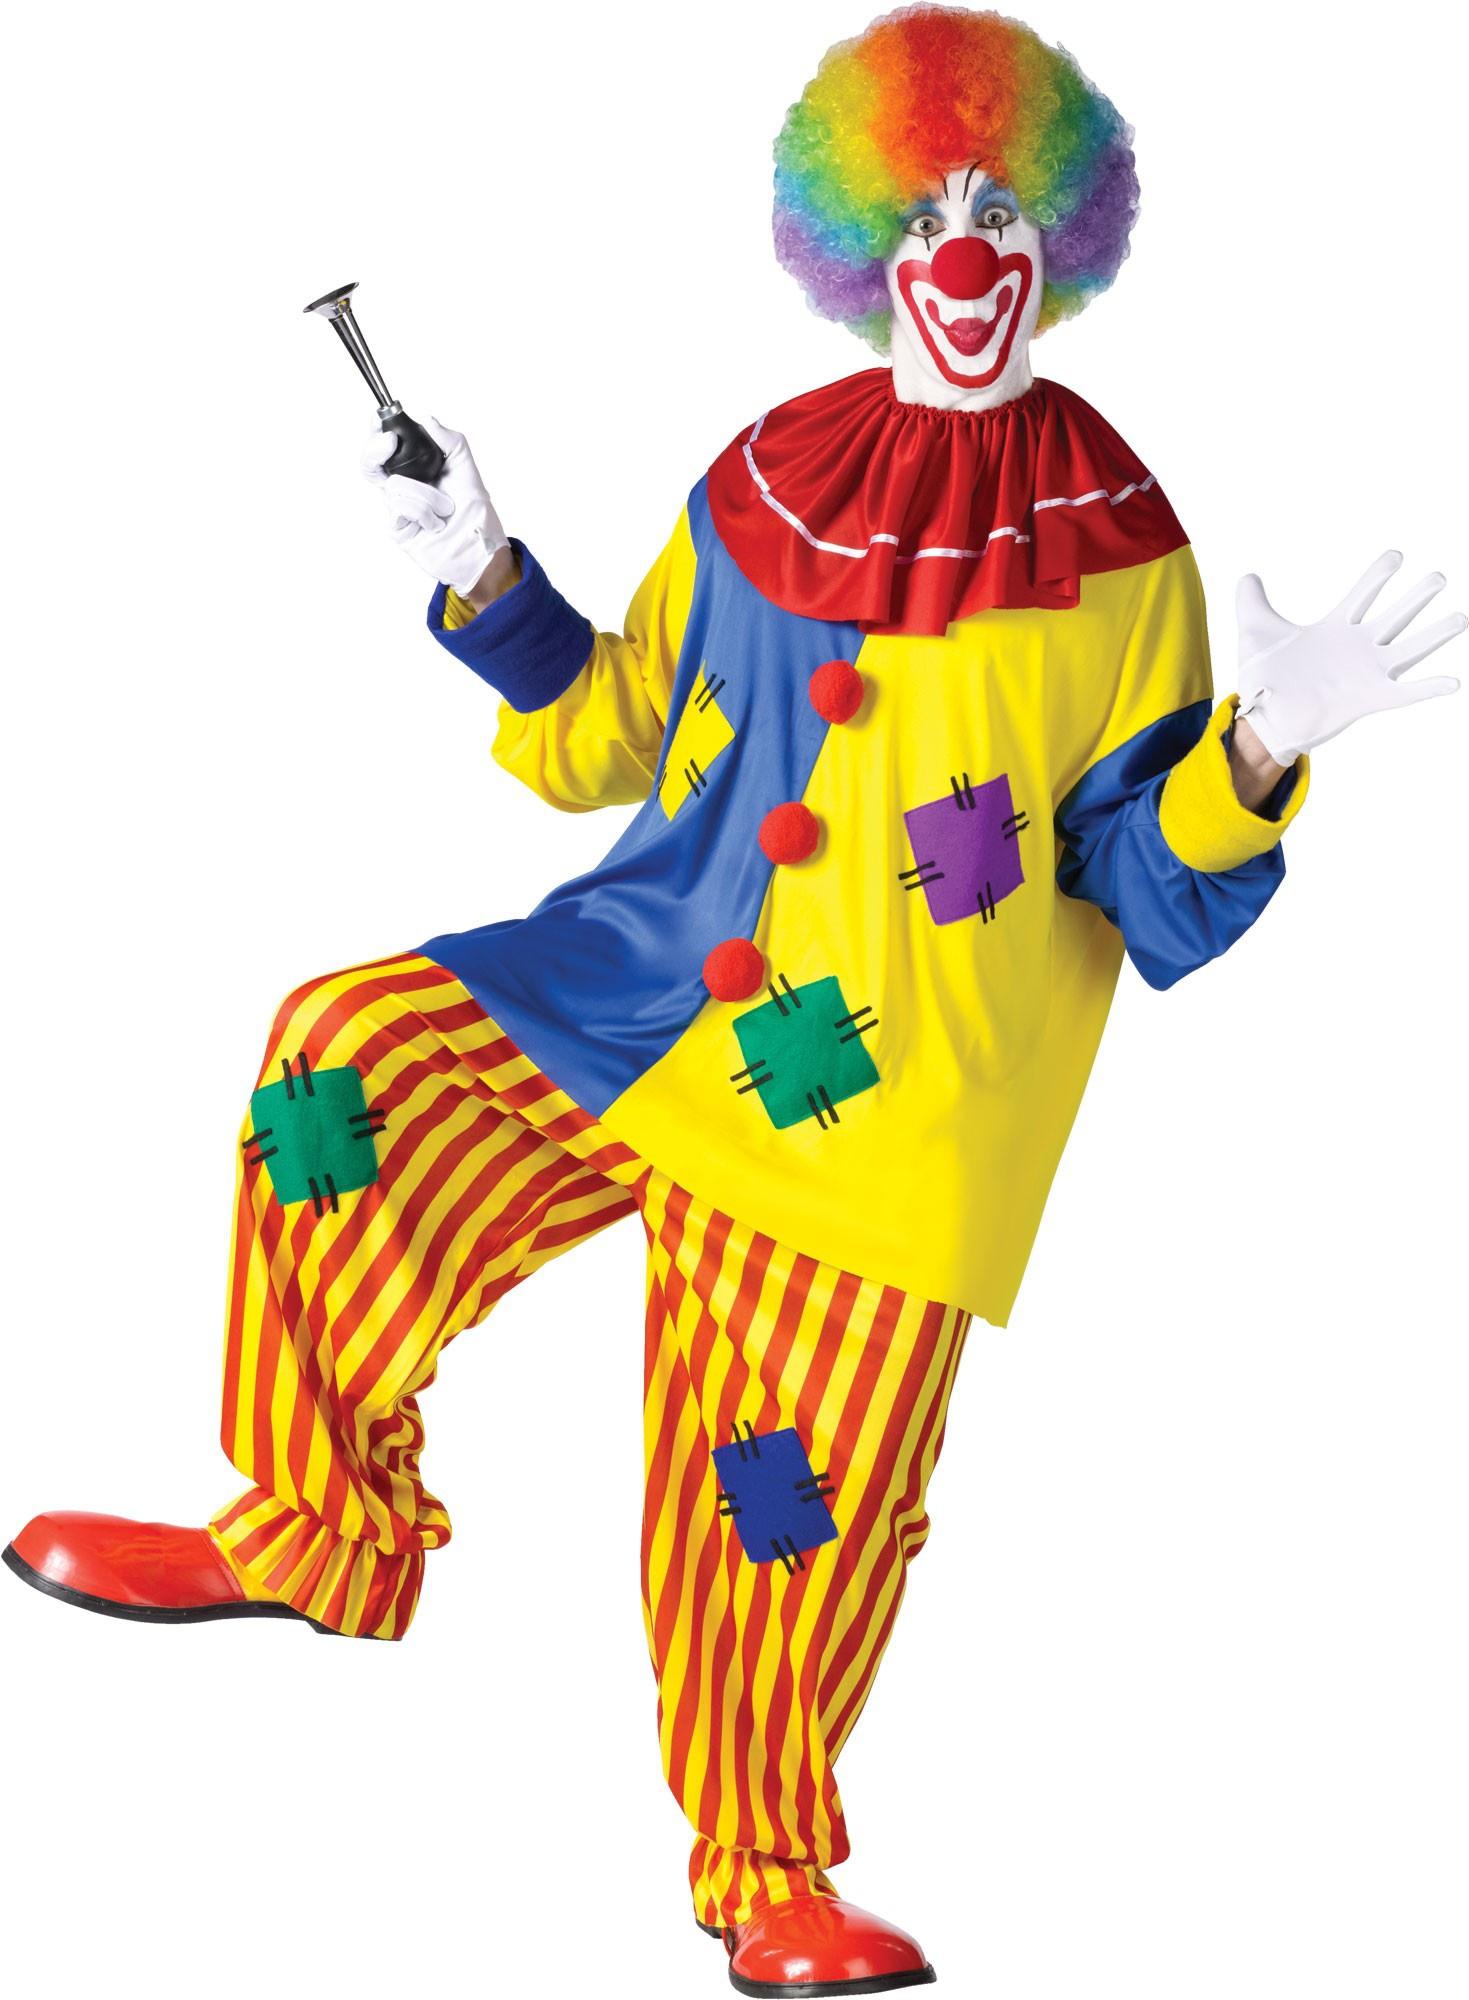 clowner bilder